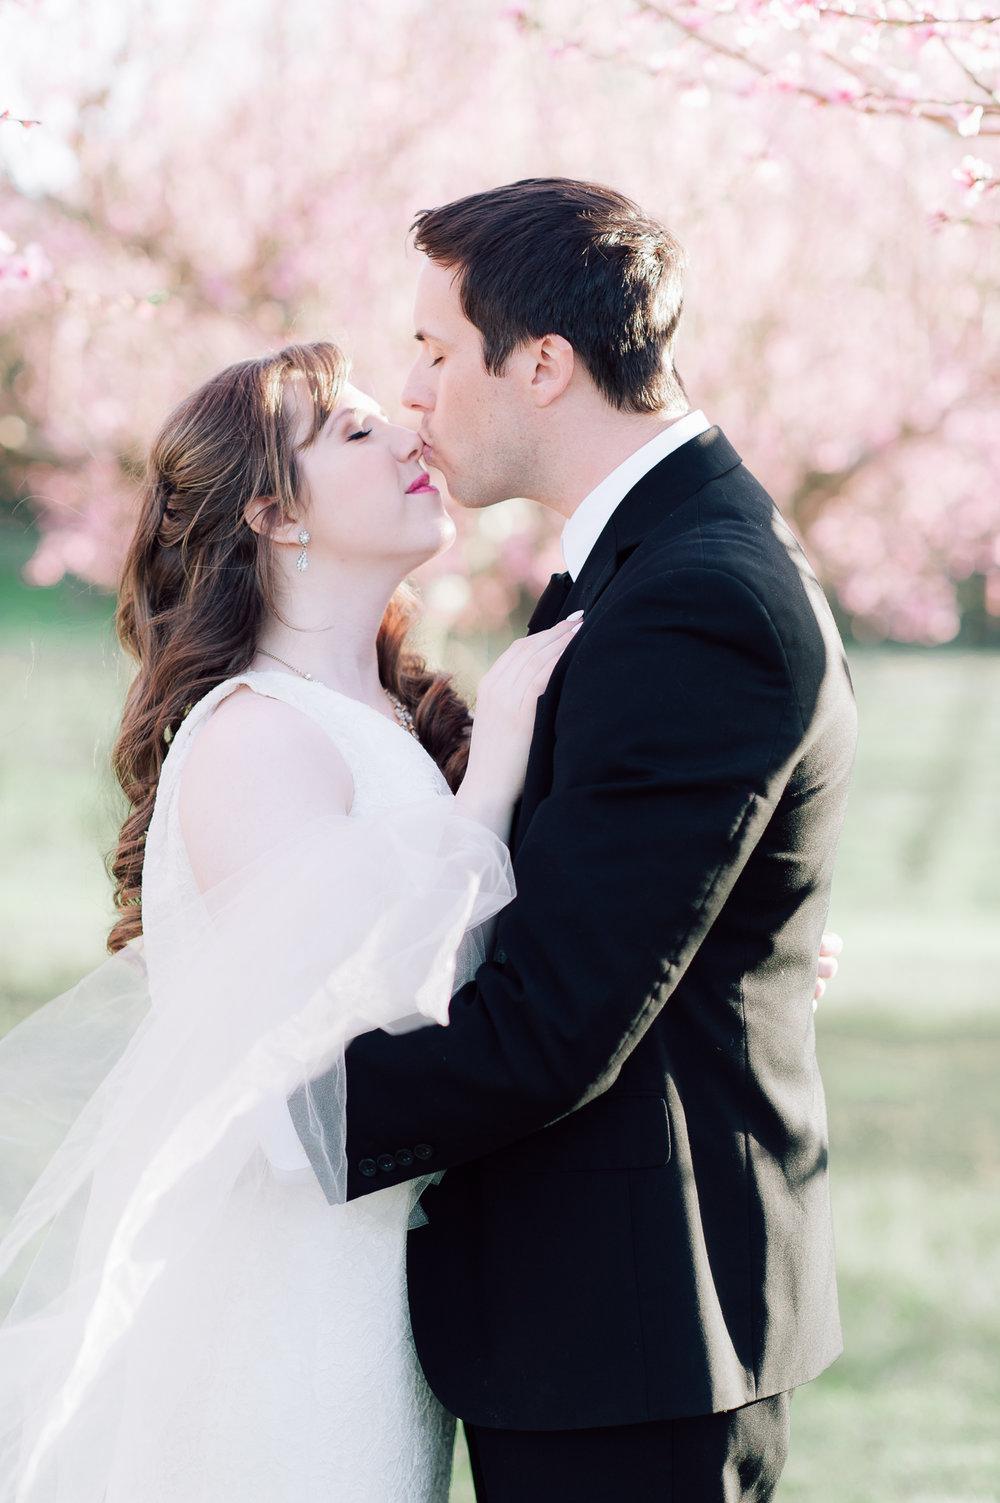 springwedding_cherryblossoms_virginiaphotographer_youseephotography_styledshoot (540).jpg